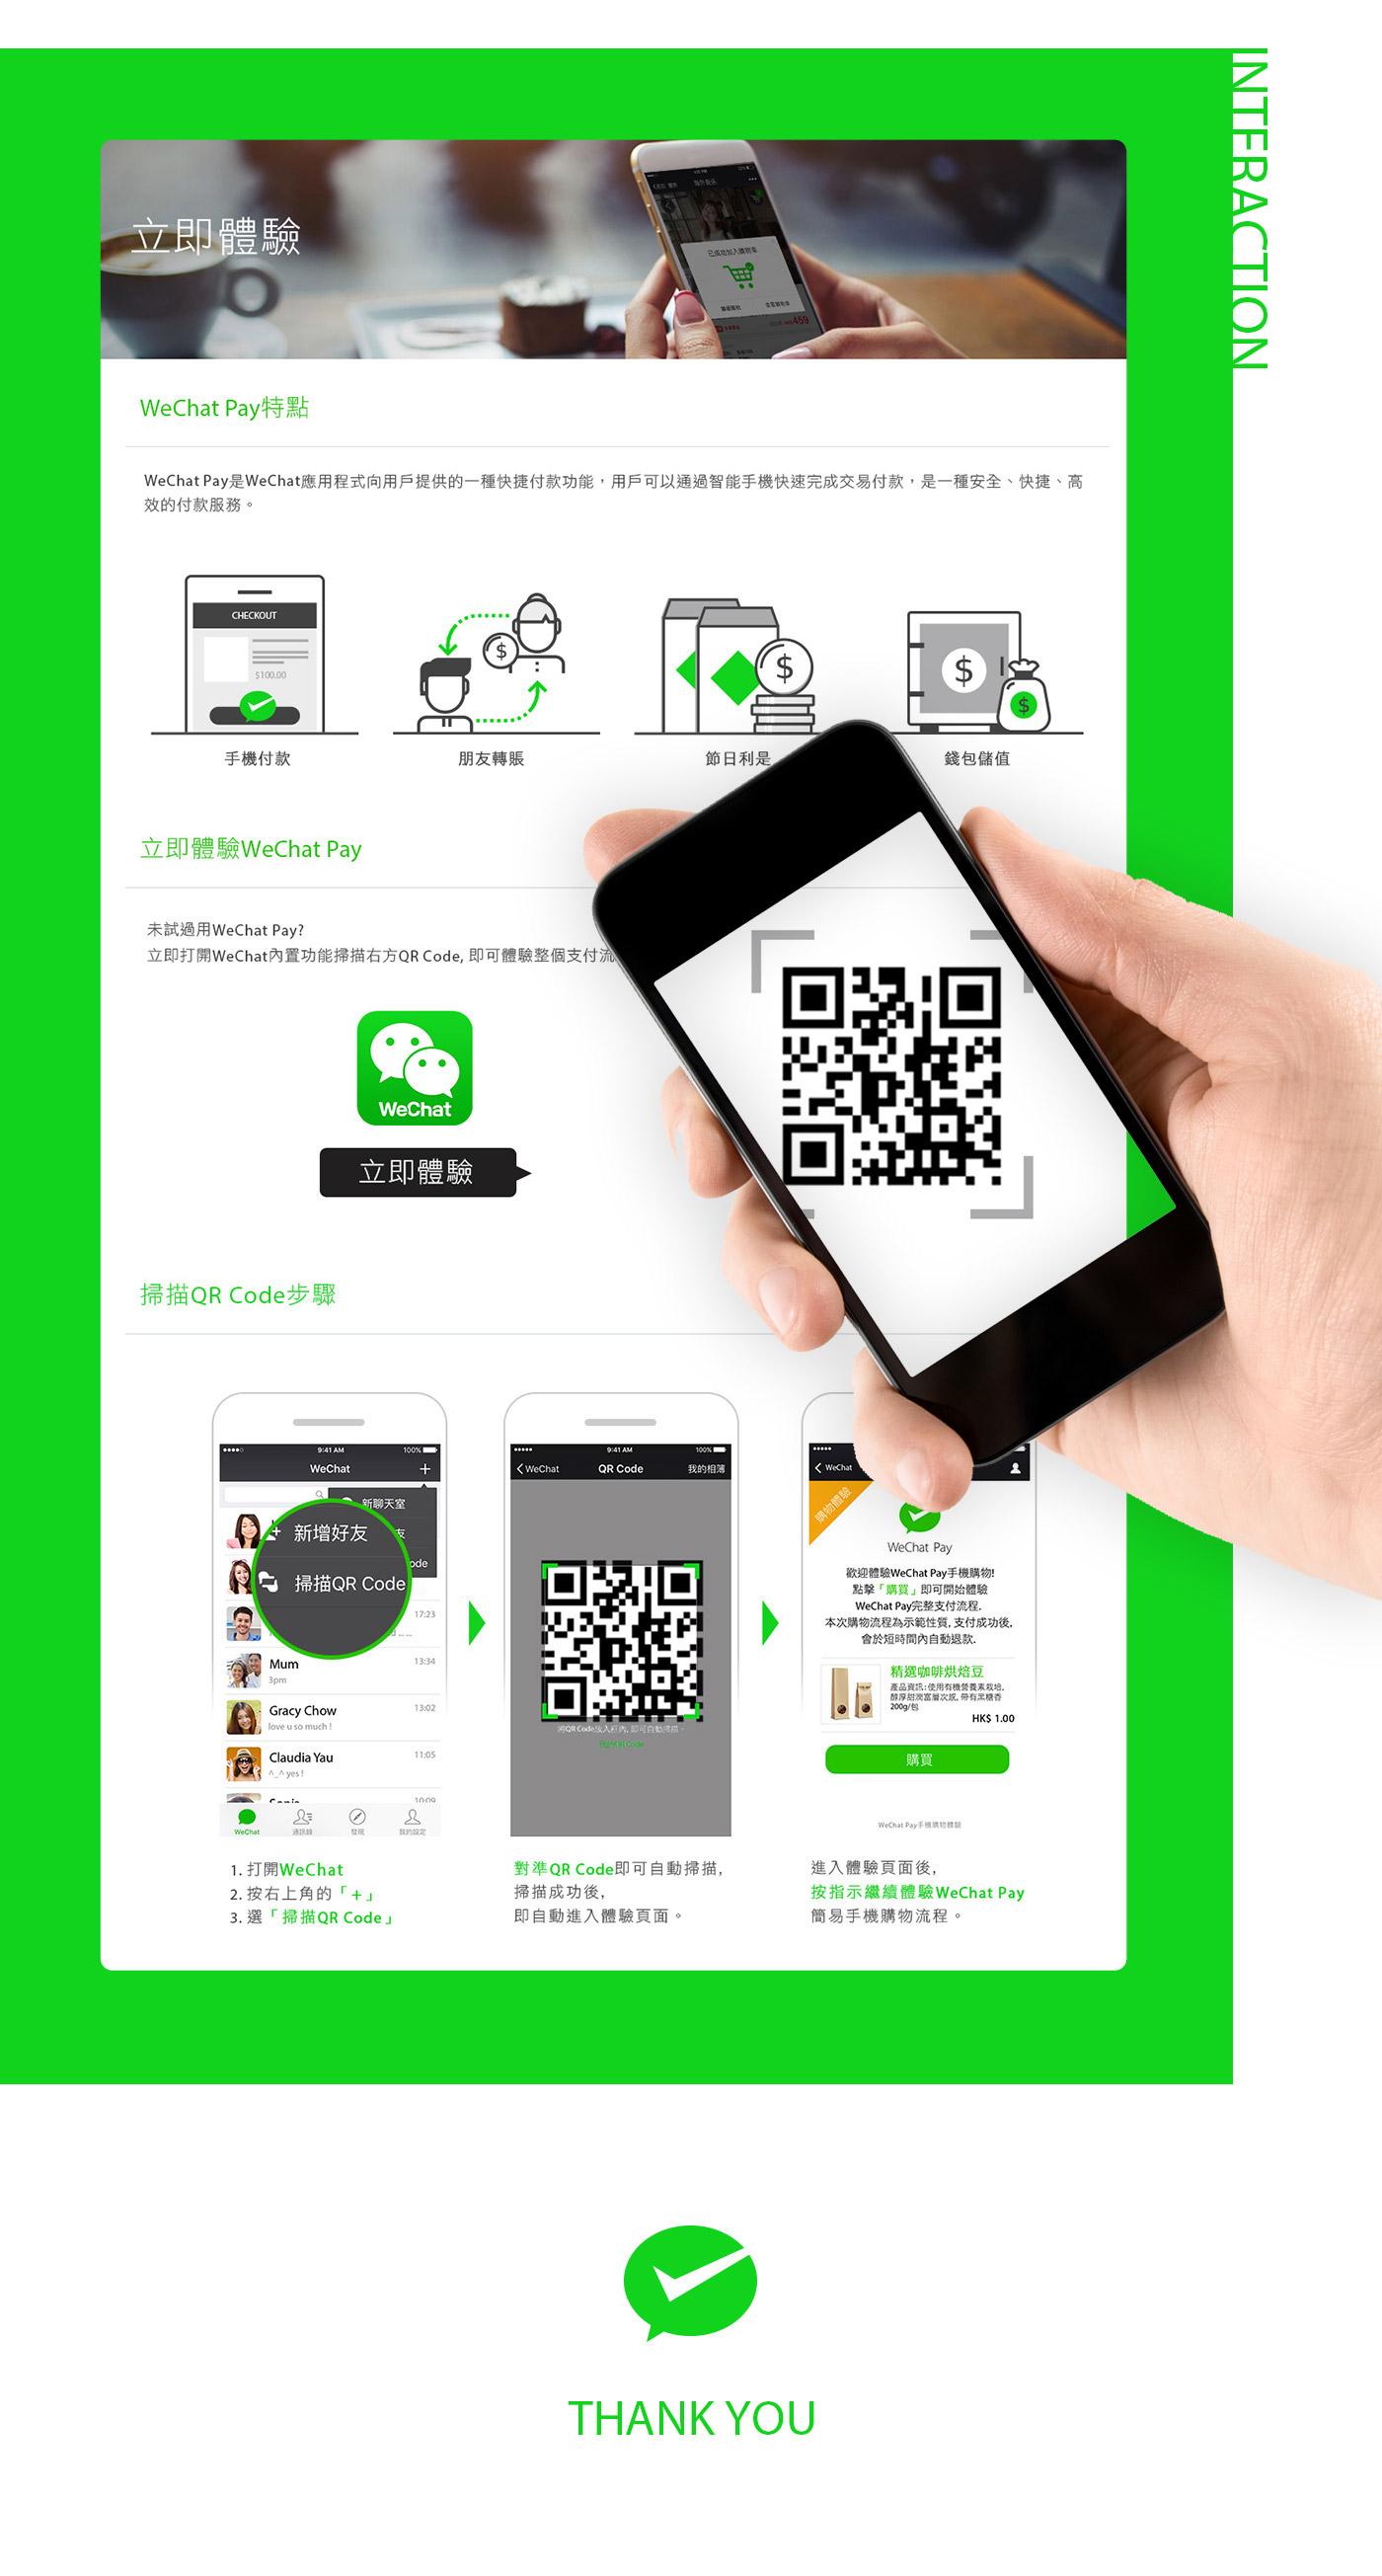 WeChat Pay - Web Portal Design (UX/UI/Icon design) on Behance